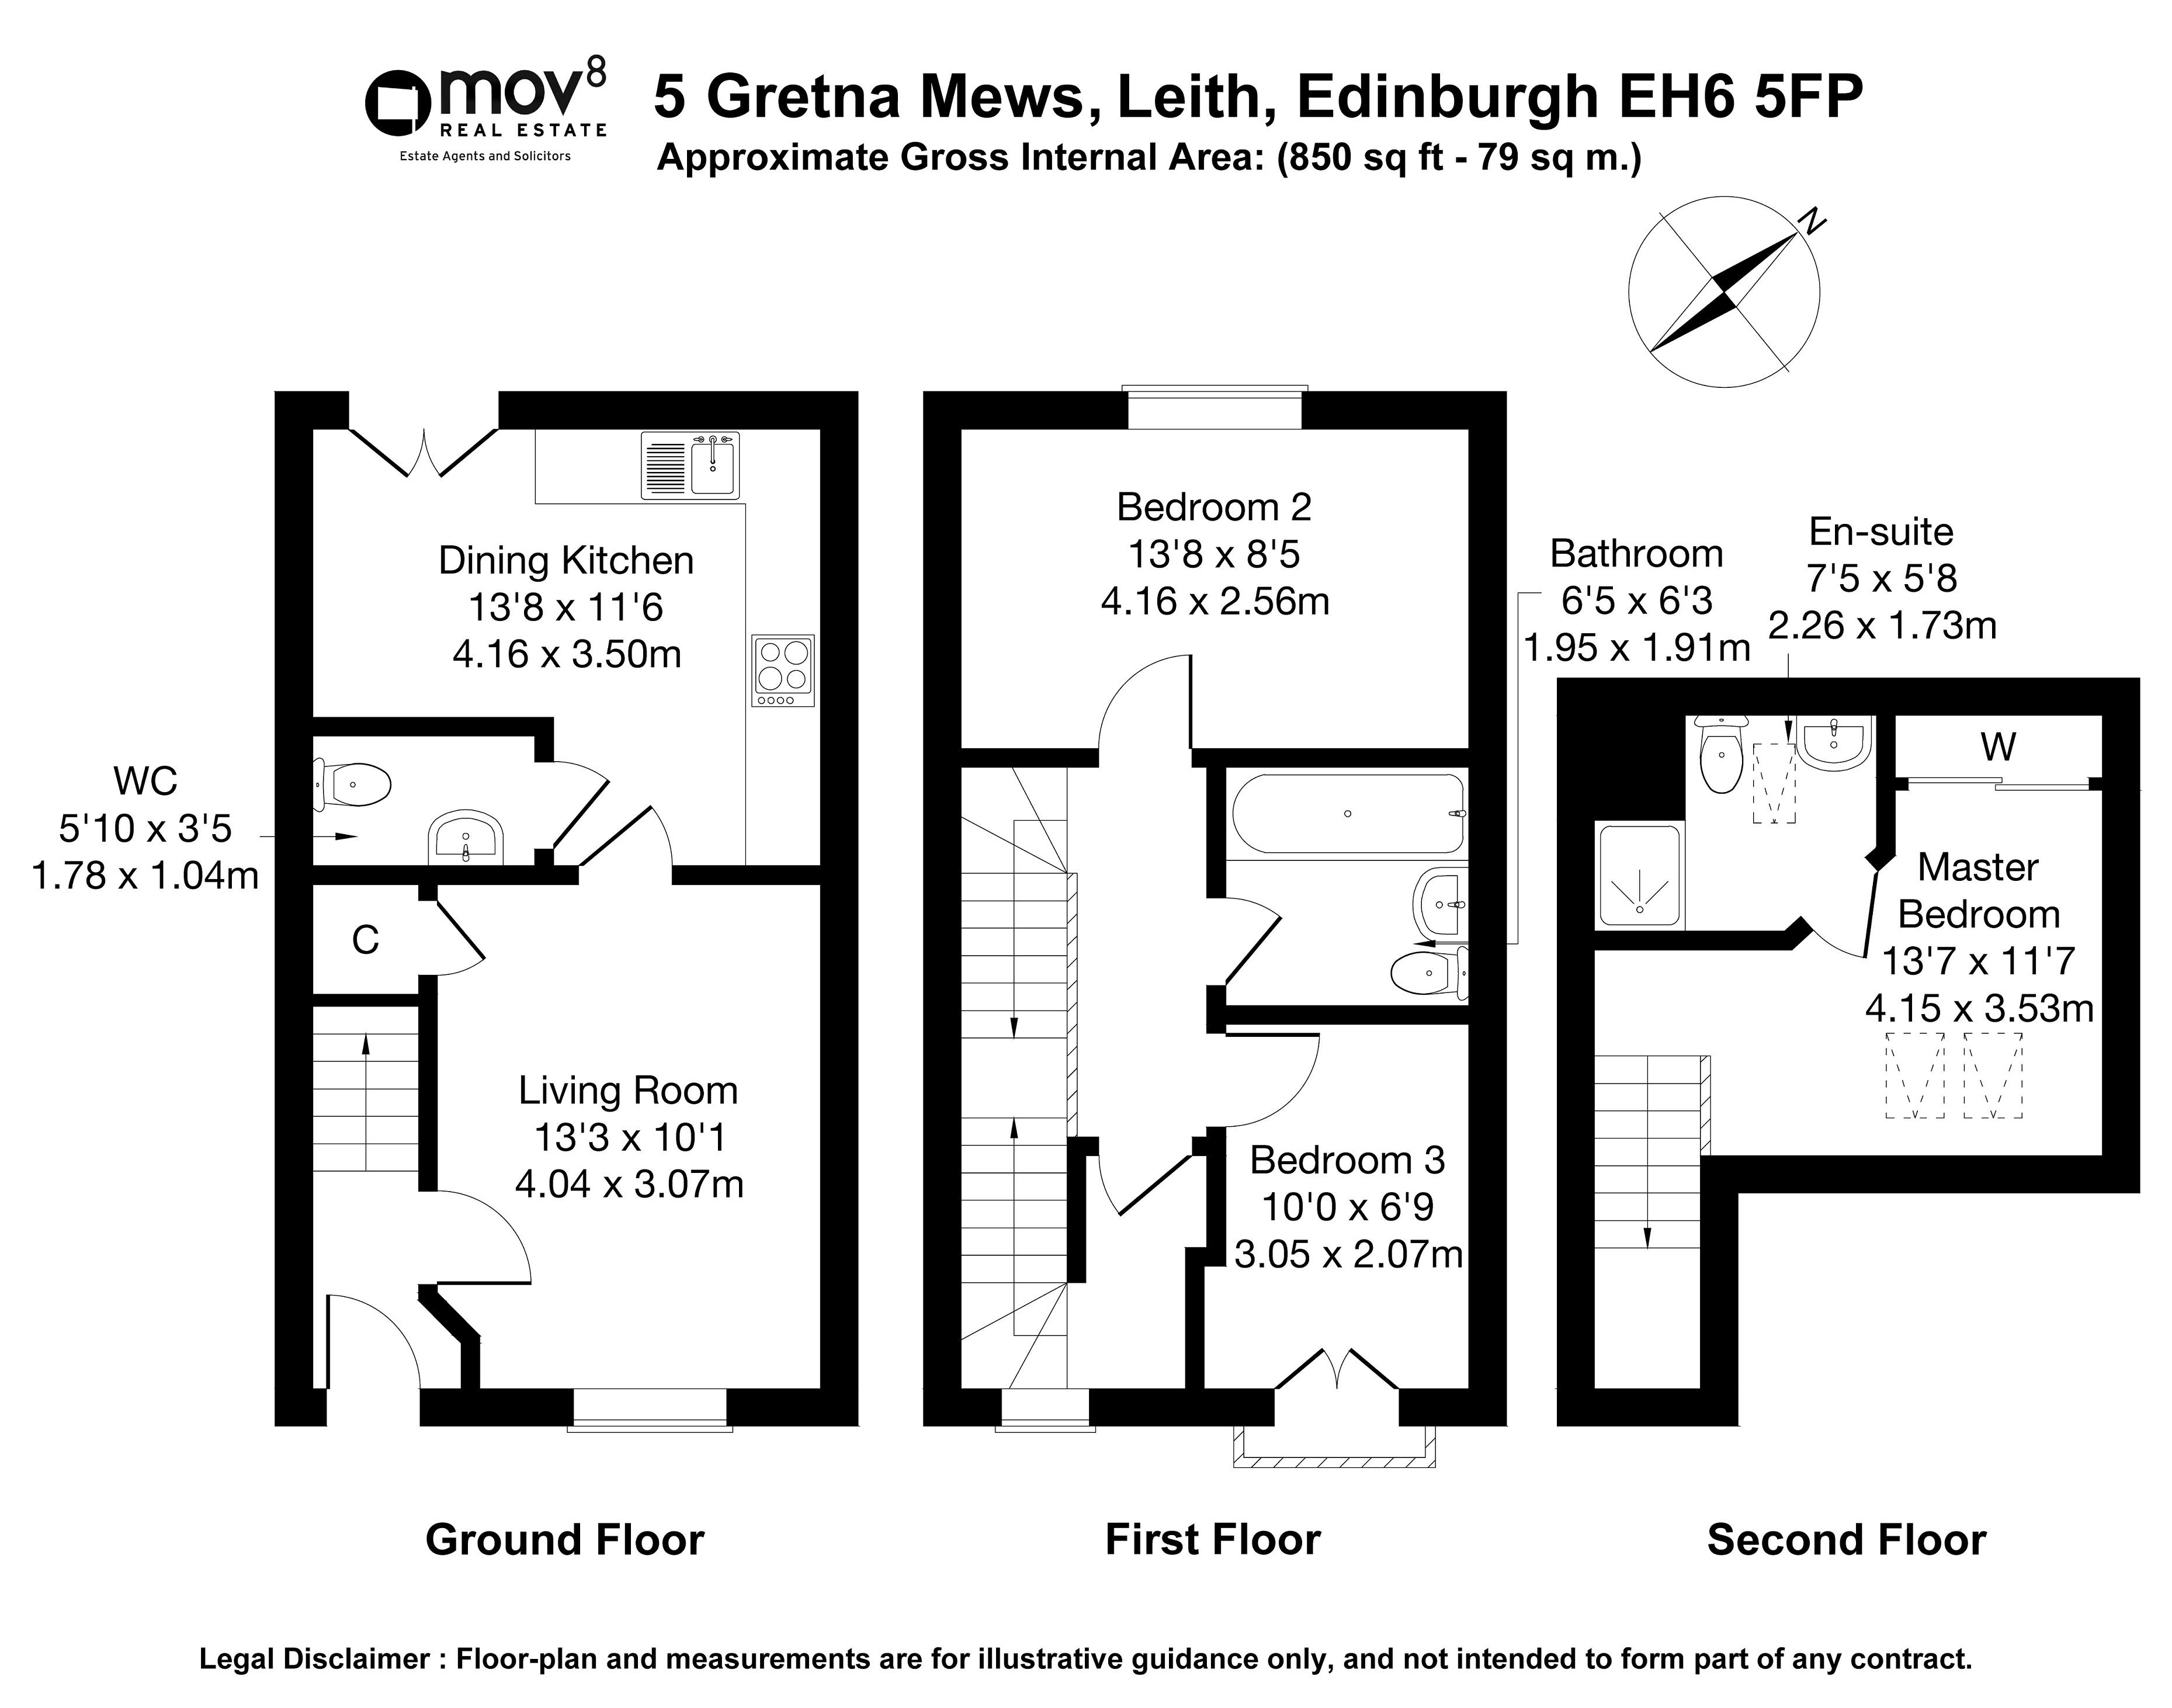 Floorplan 1 of 5 Gretna Mews, Leith, Edinburgh, EH6 5FP